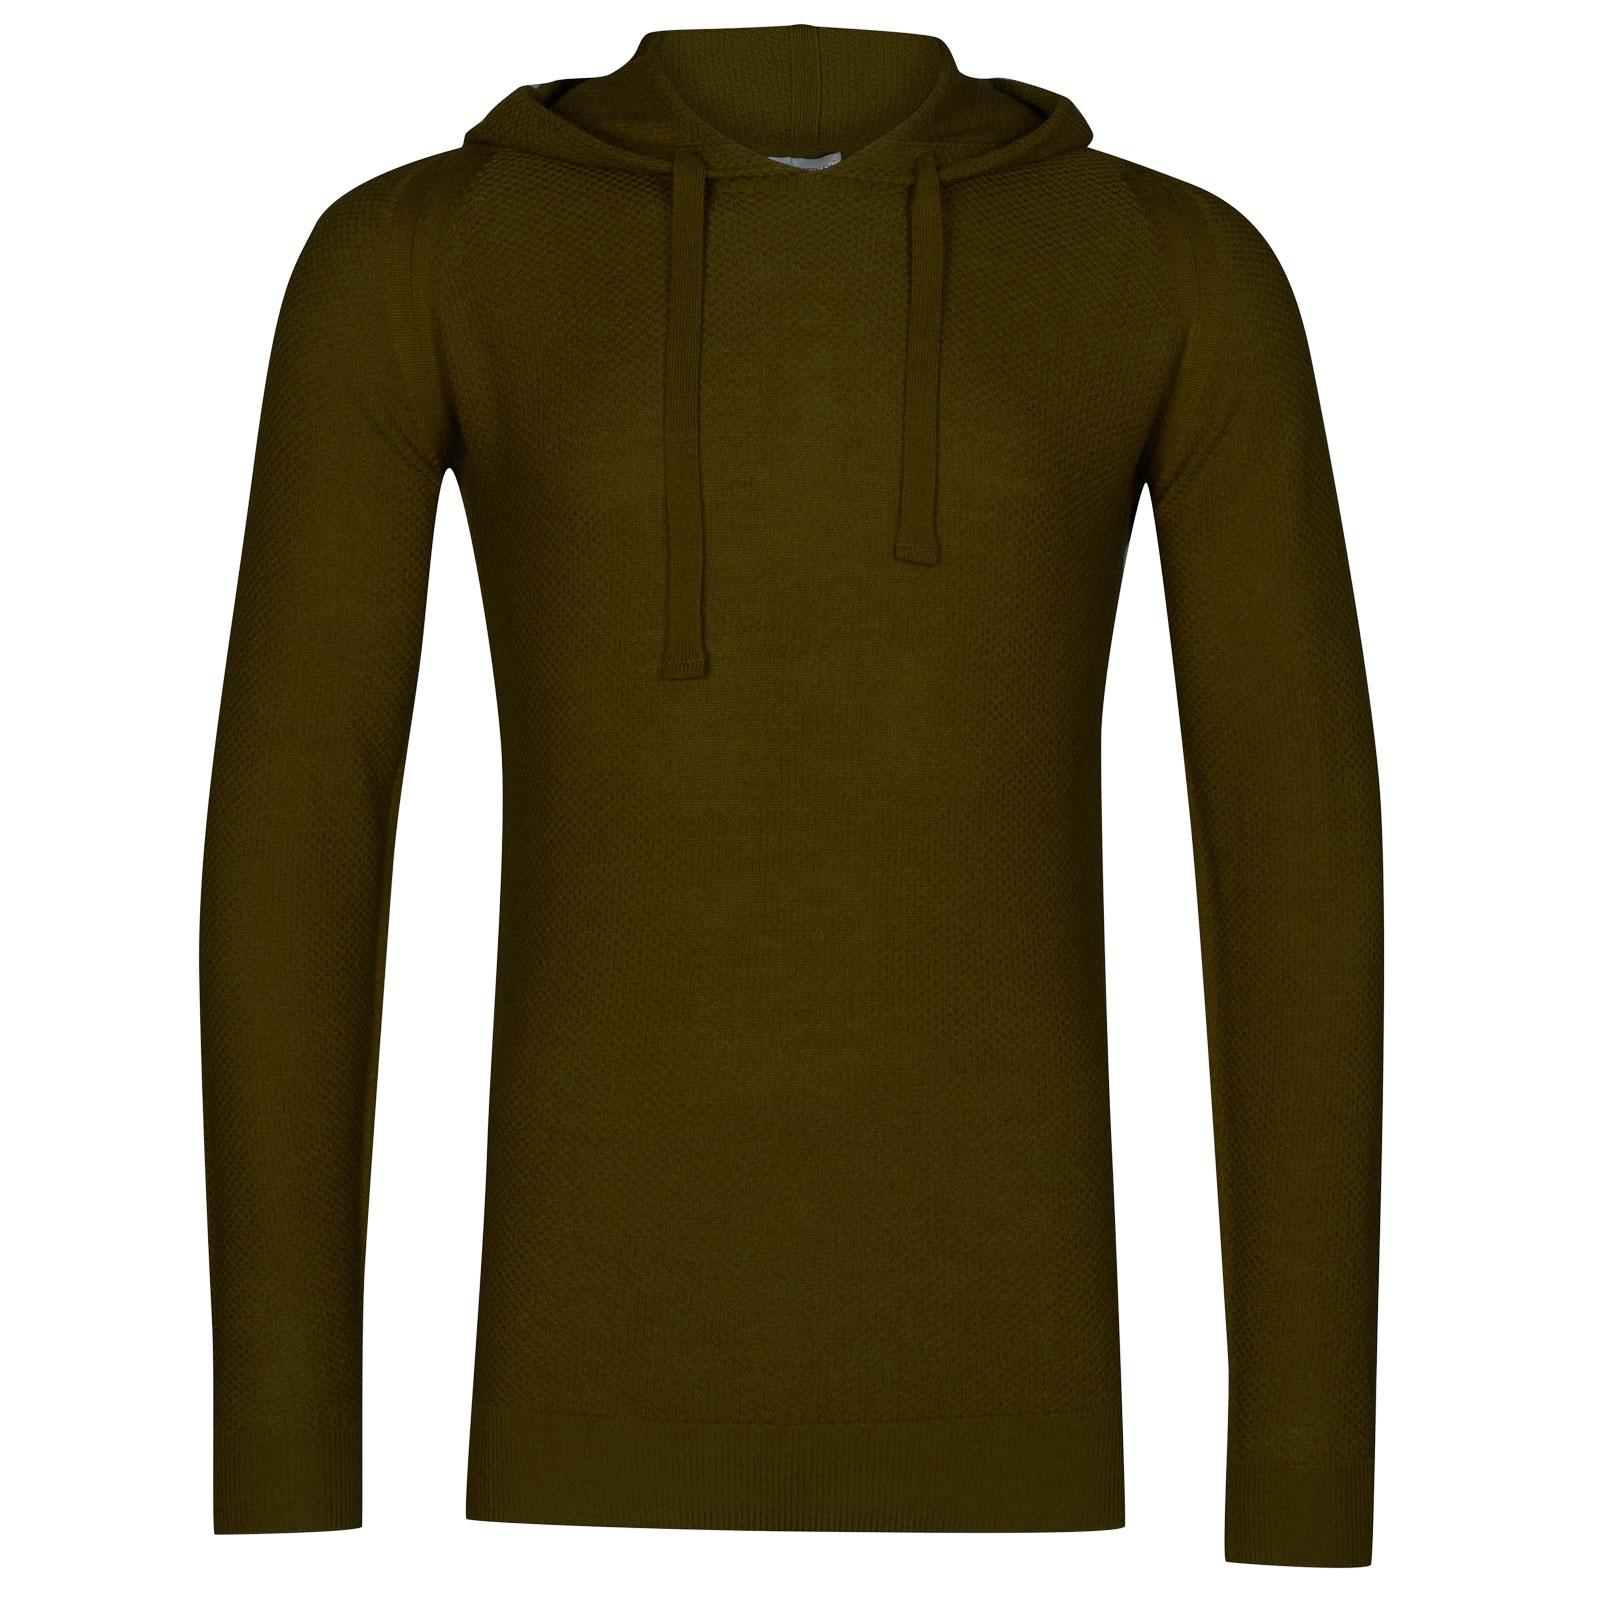 John Smedley 4singular Merino Wool Pullover in Khaki-L